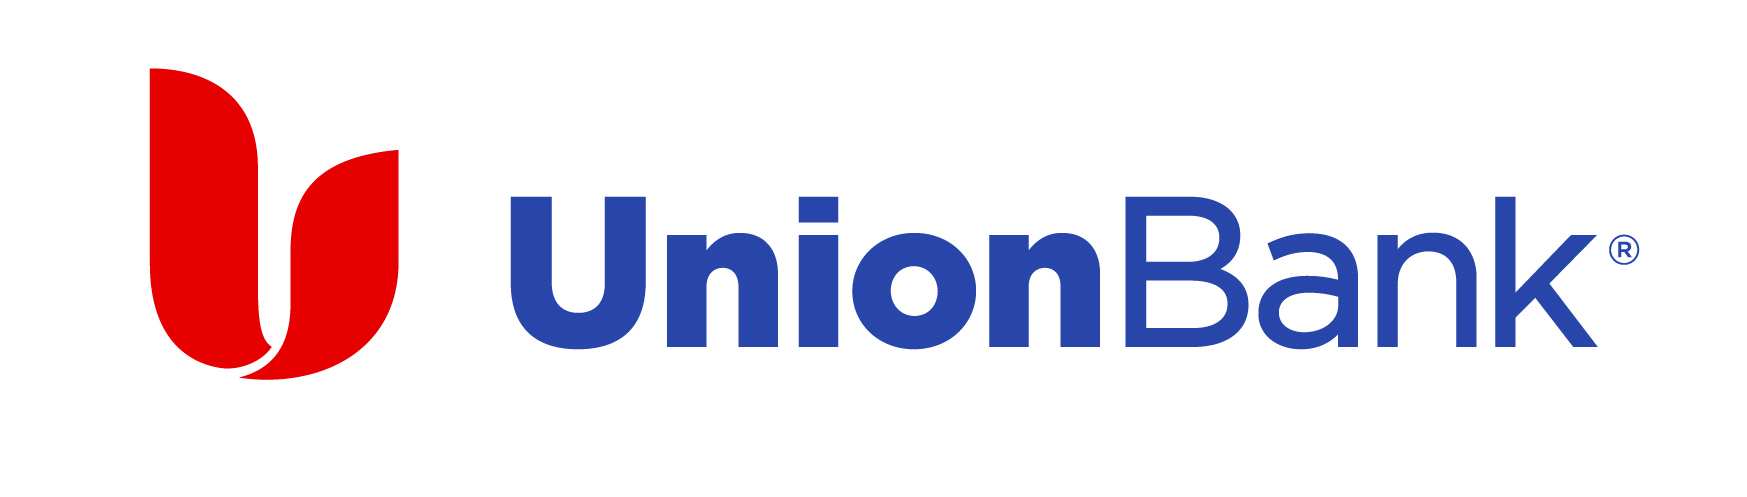 union_bacnk.jpg